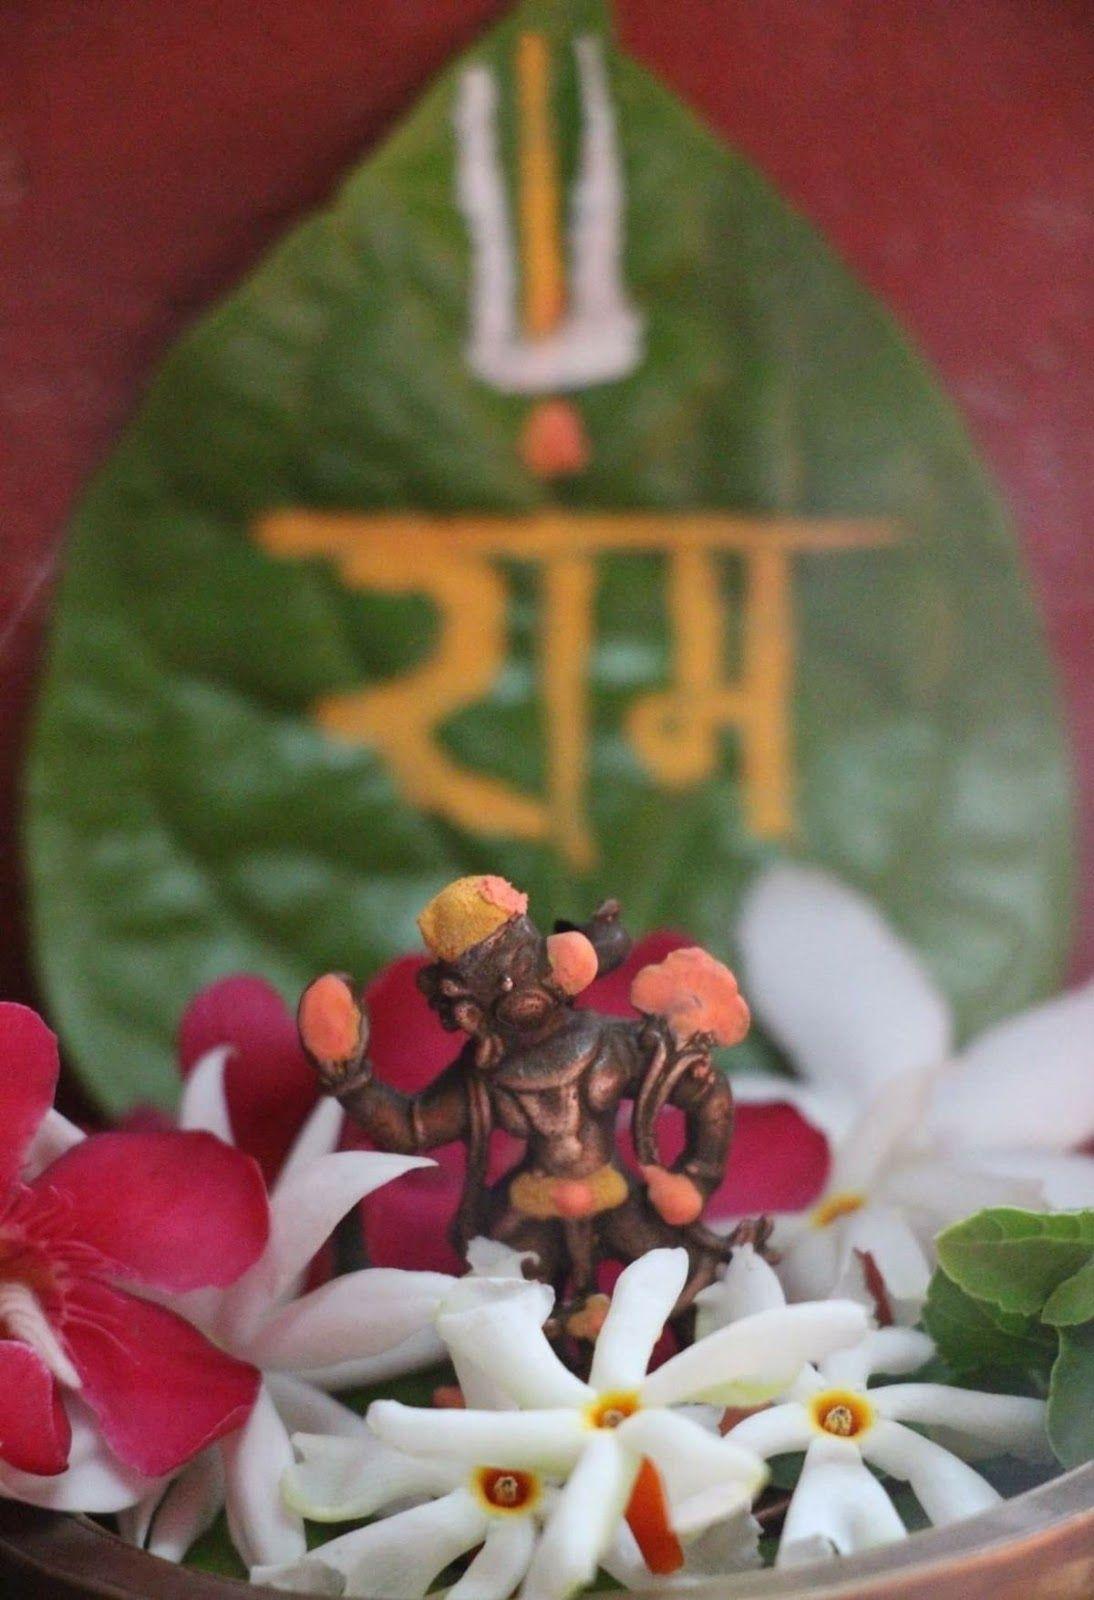 300 Lord Hanuman Ji Full Hd Images Pics À¤¹à¤¨ À¤® À¤¨ À¤« À¤Ÿ Free Download 2020 Happy New Year 2020 Lord Hanuman Wallpapers Hanuman Wallpaper Lord Shiva Painting